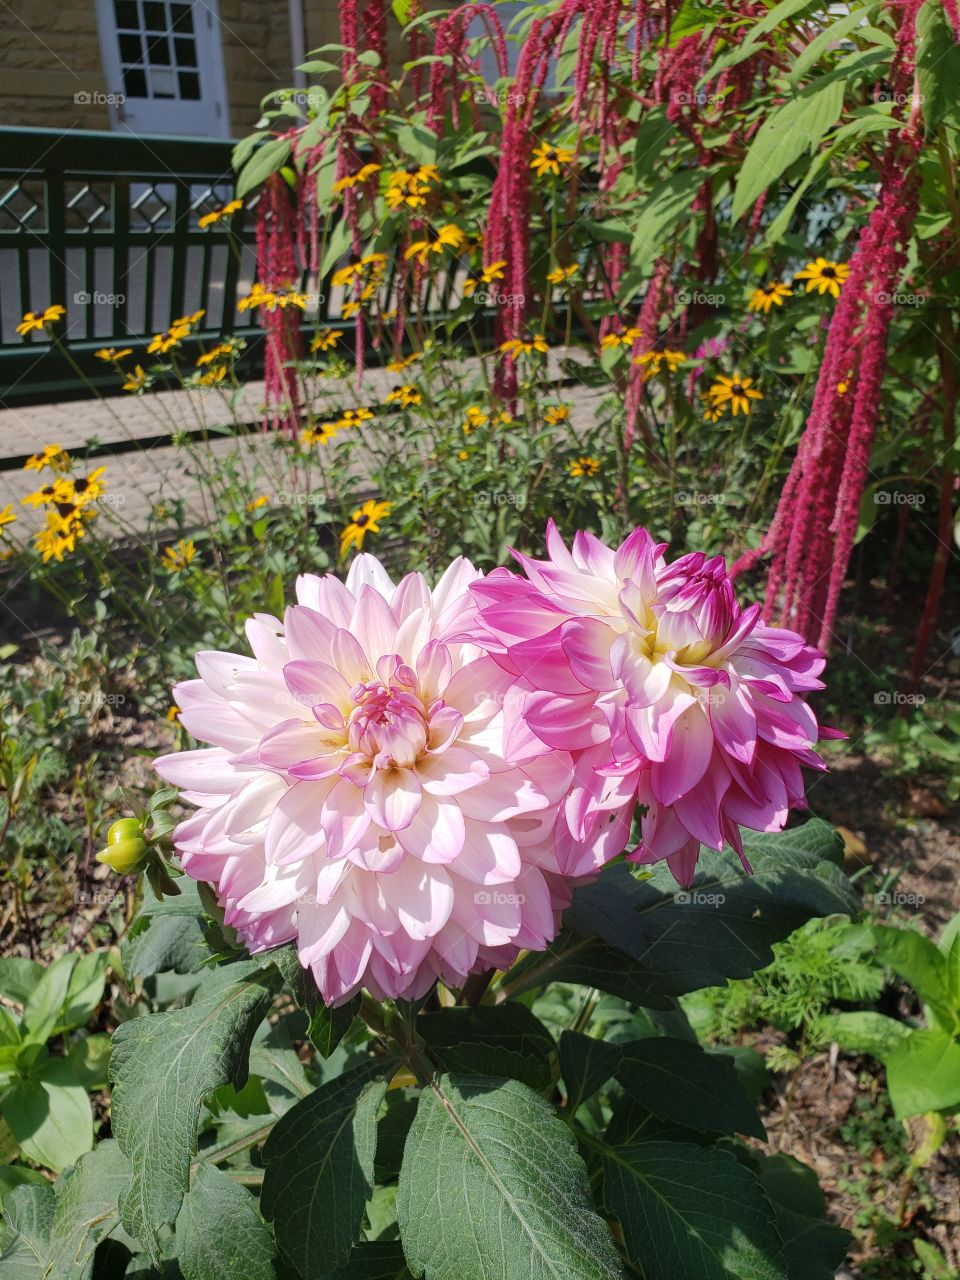 Flowers in sunshine